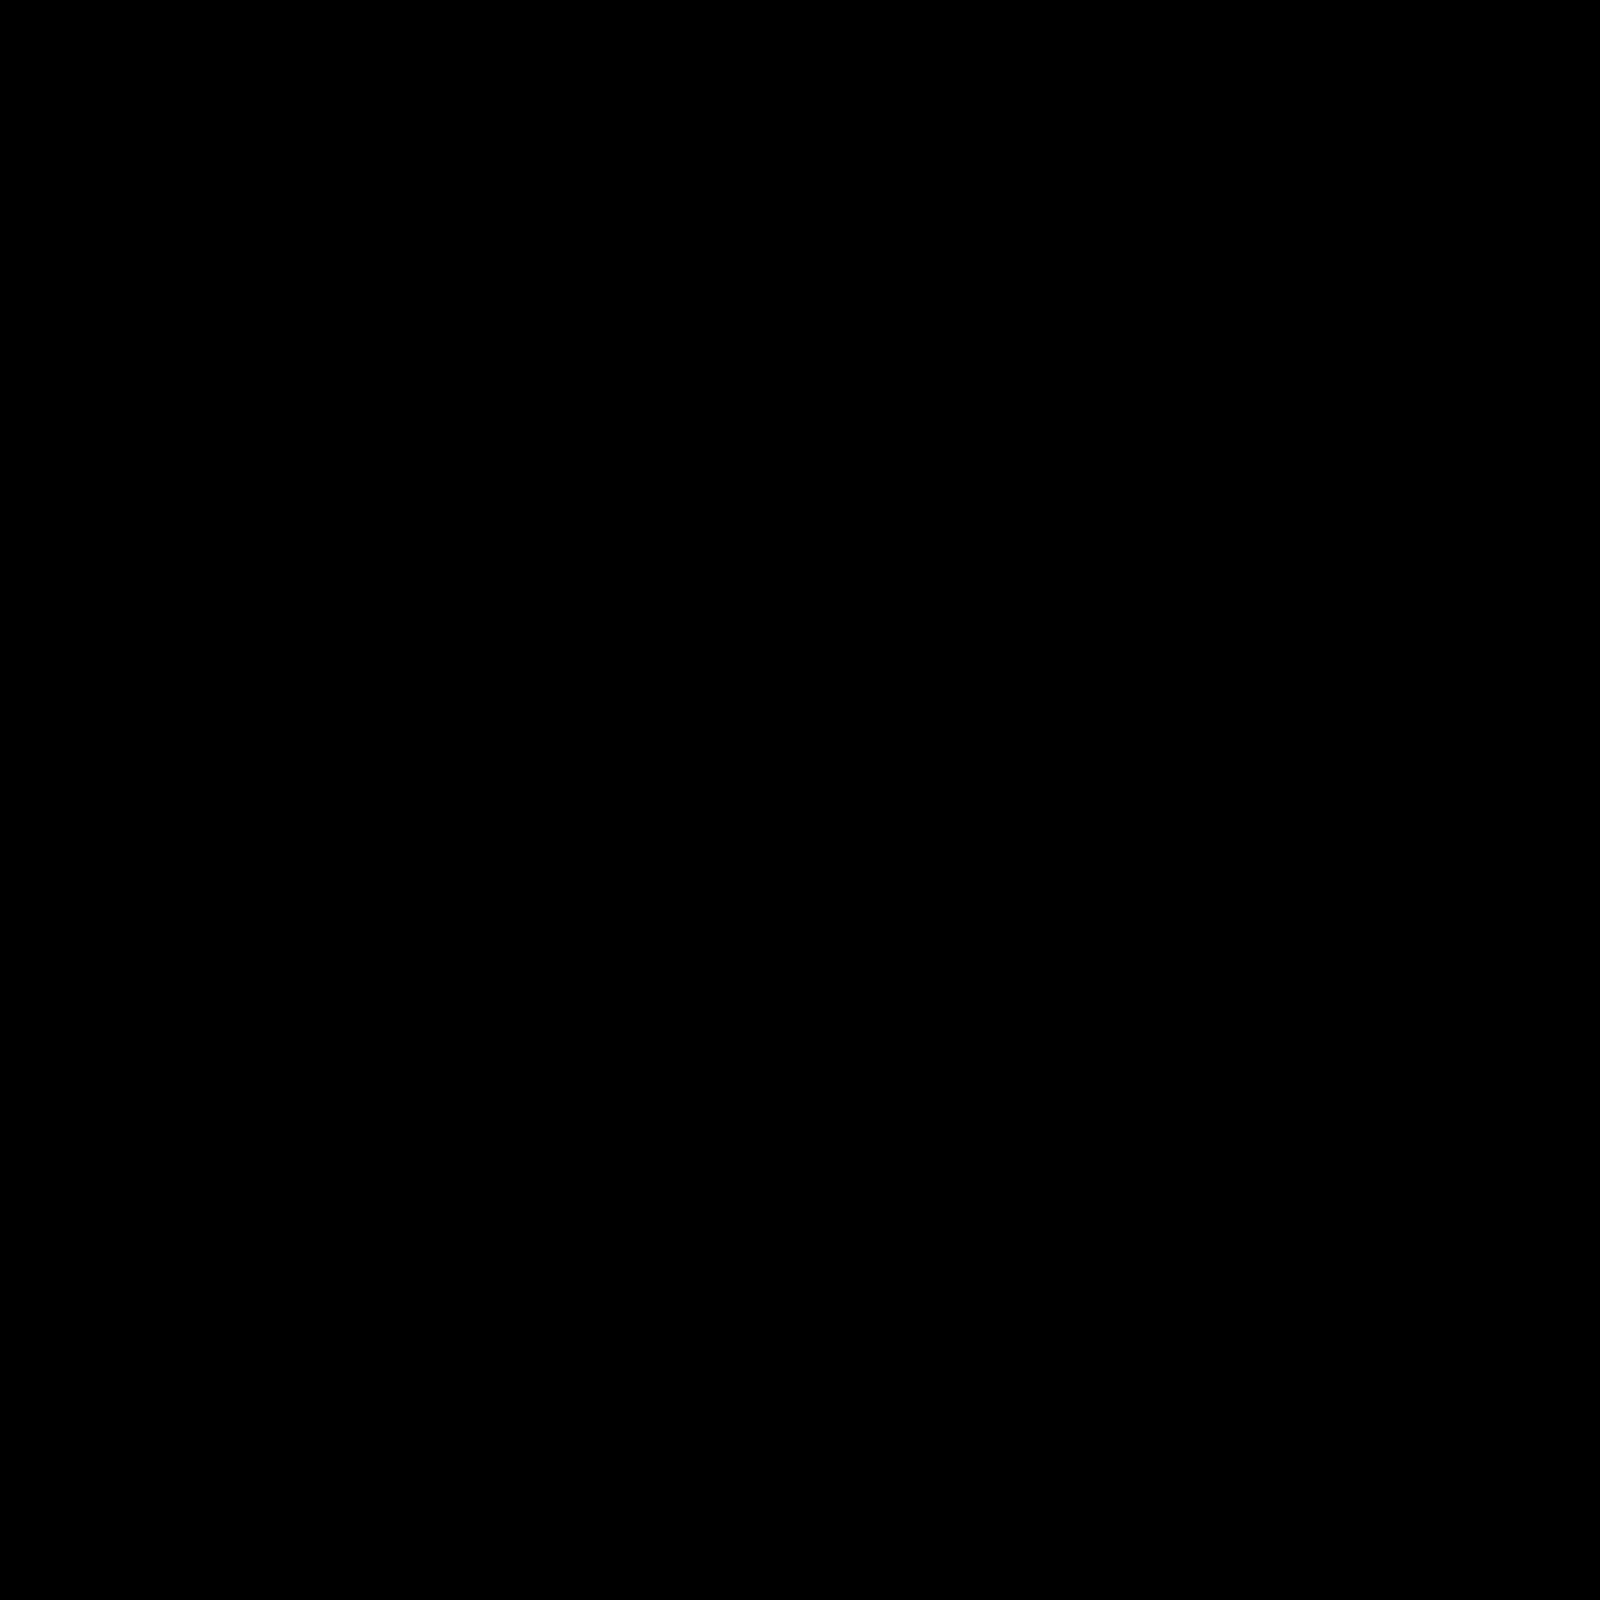 Kula do kręgli icon